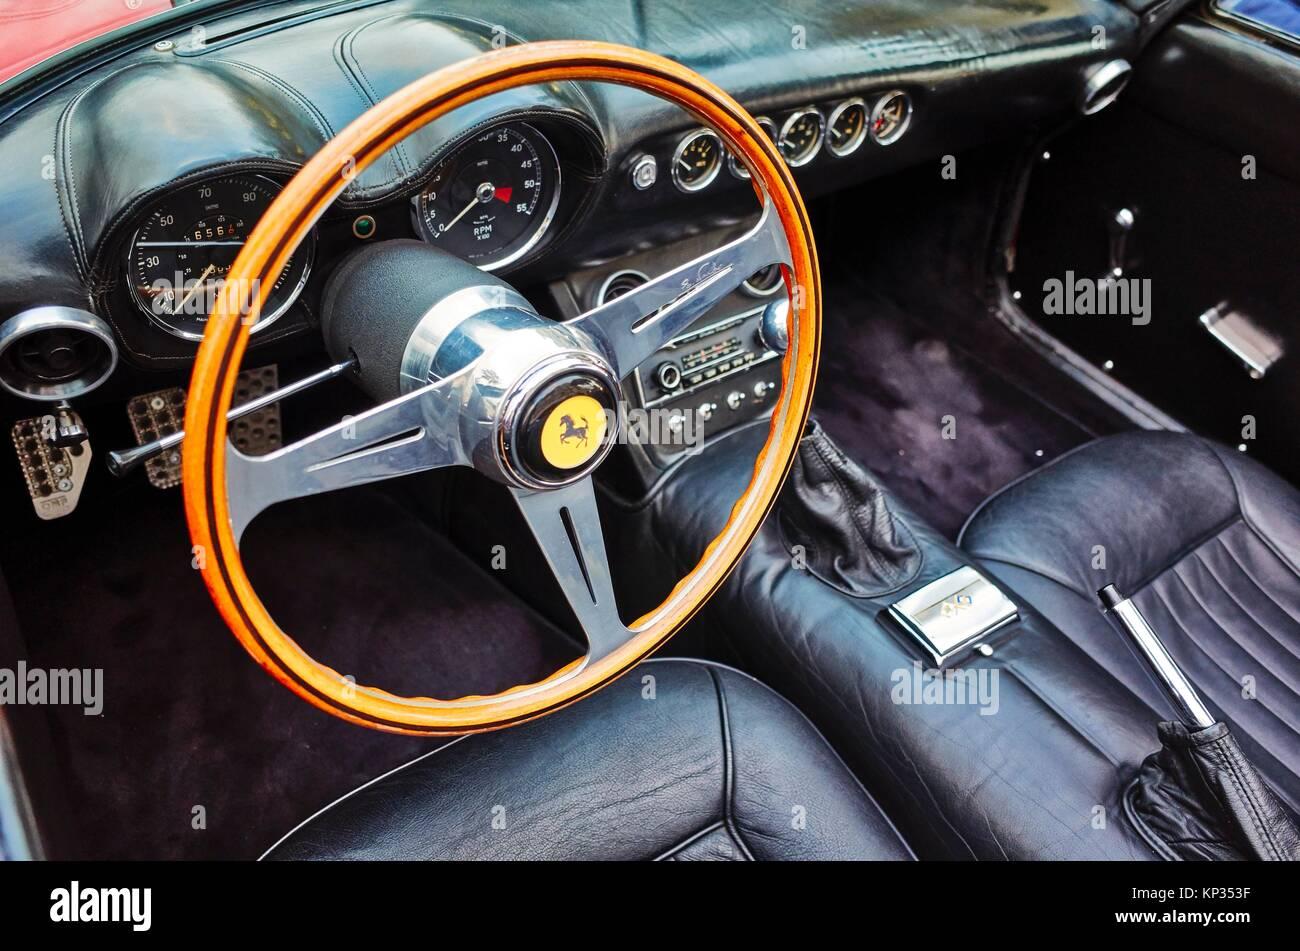 The dashboard of an historical Ferrari in Montecarlo, Monaco Principality. - Stock Image